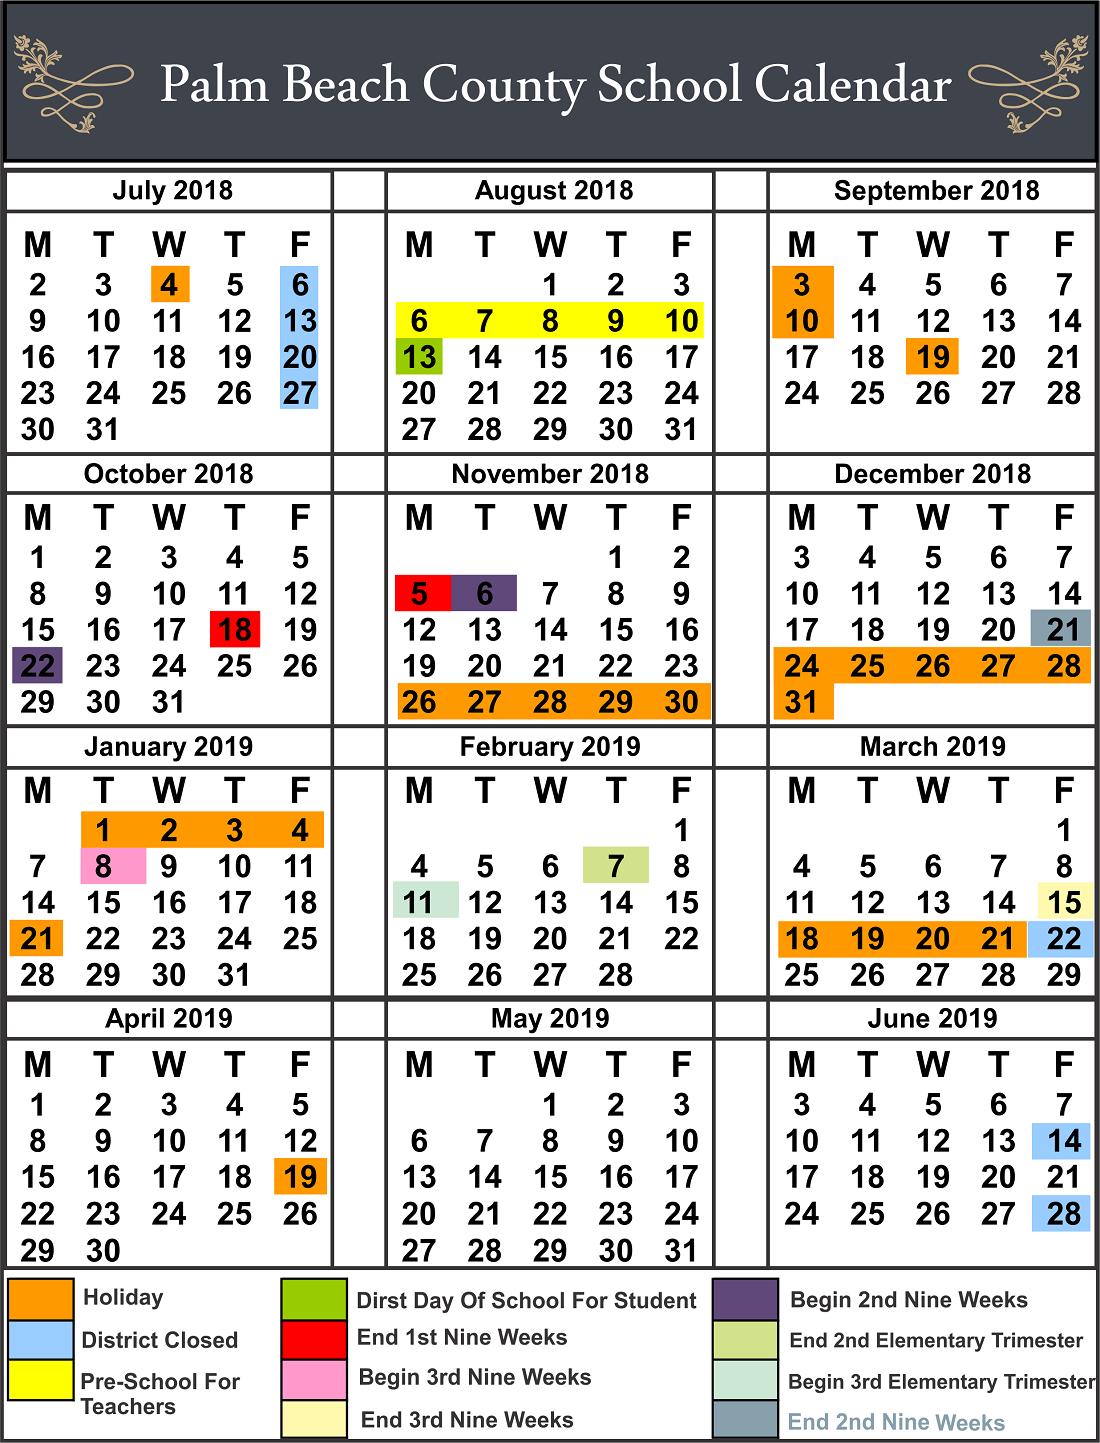 Palm Beach County School Calendar You Calendars School Calendar Palm Beach County Calendar